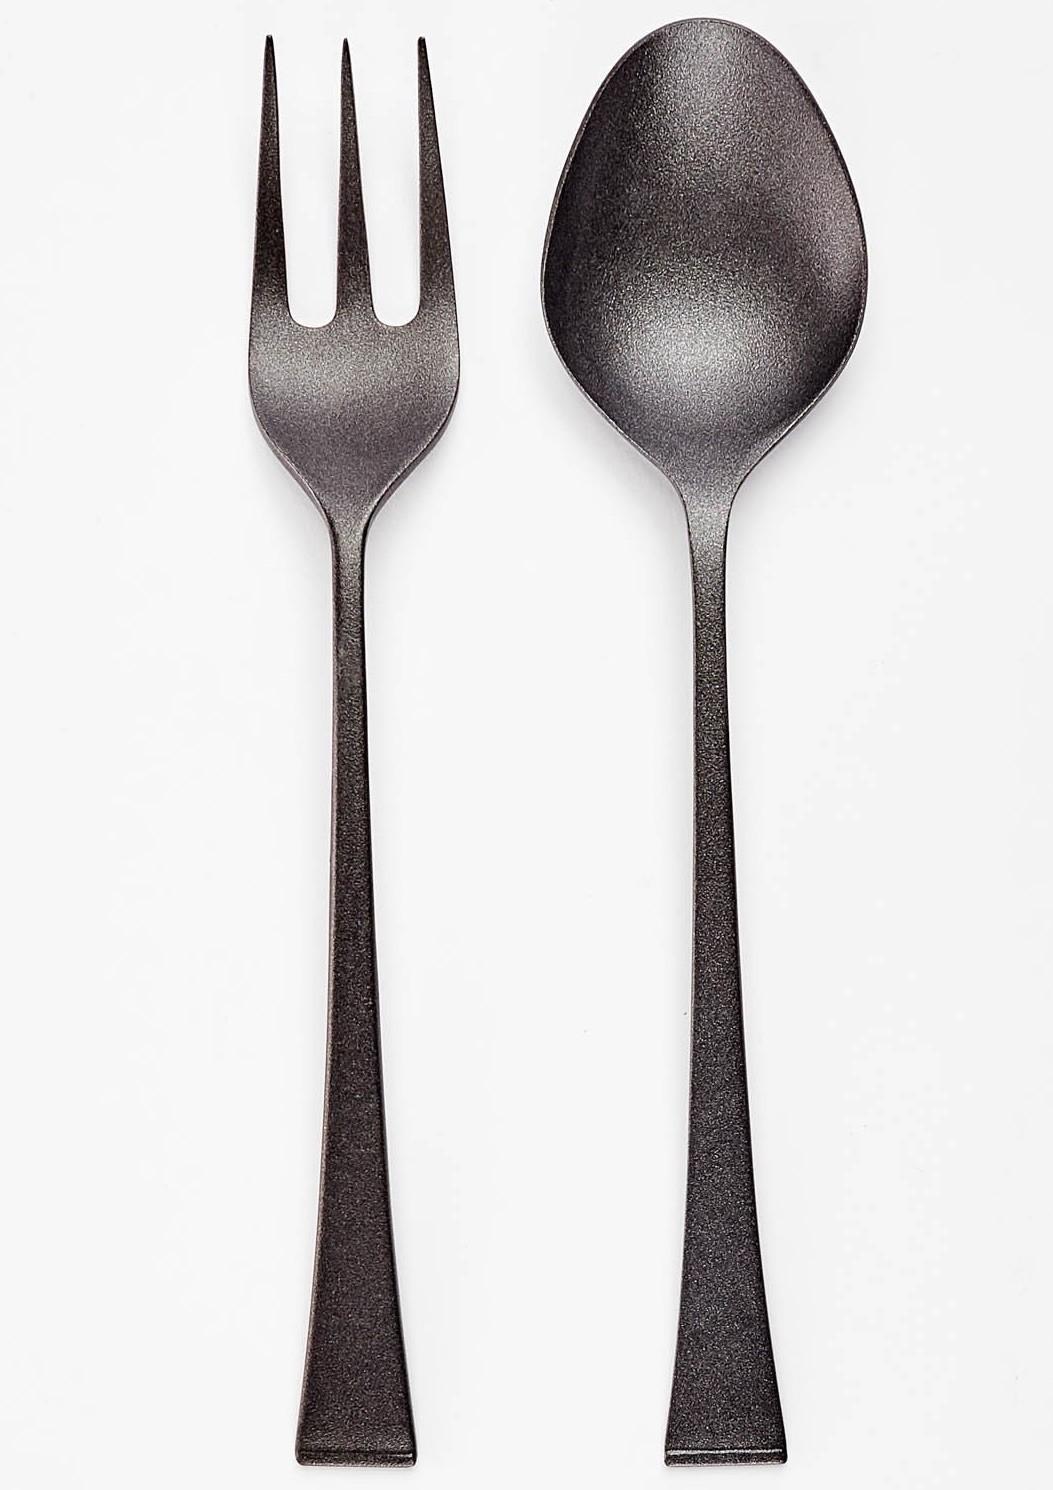 black serving utensils